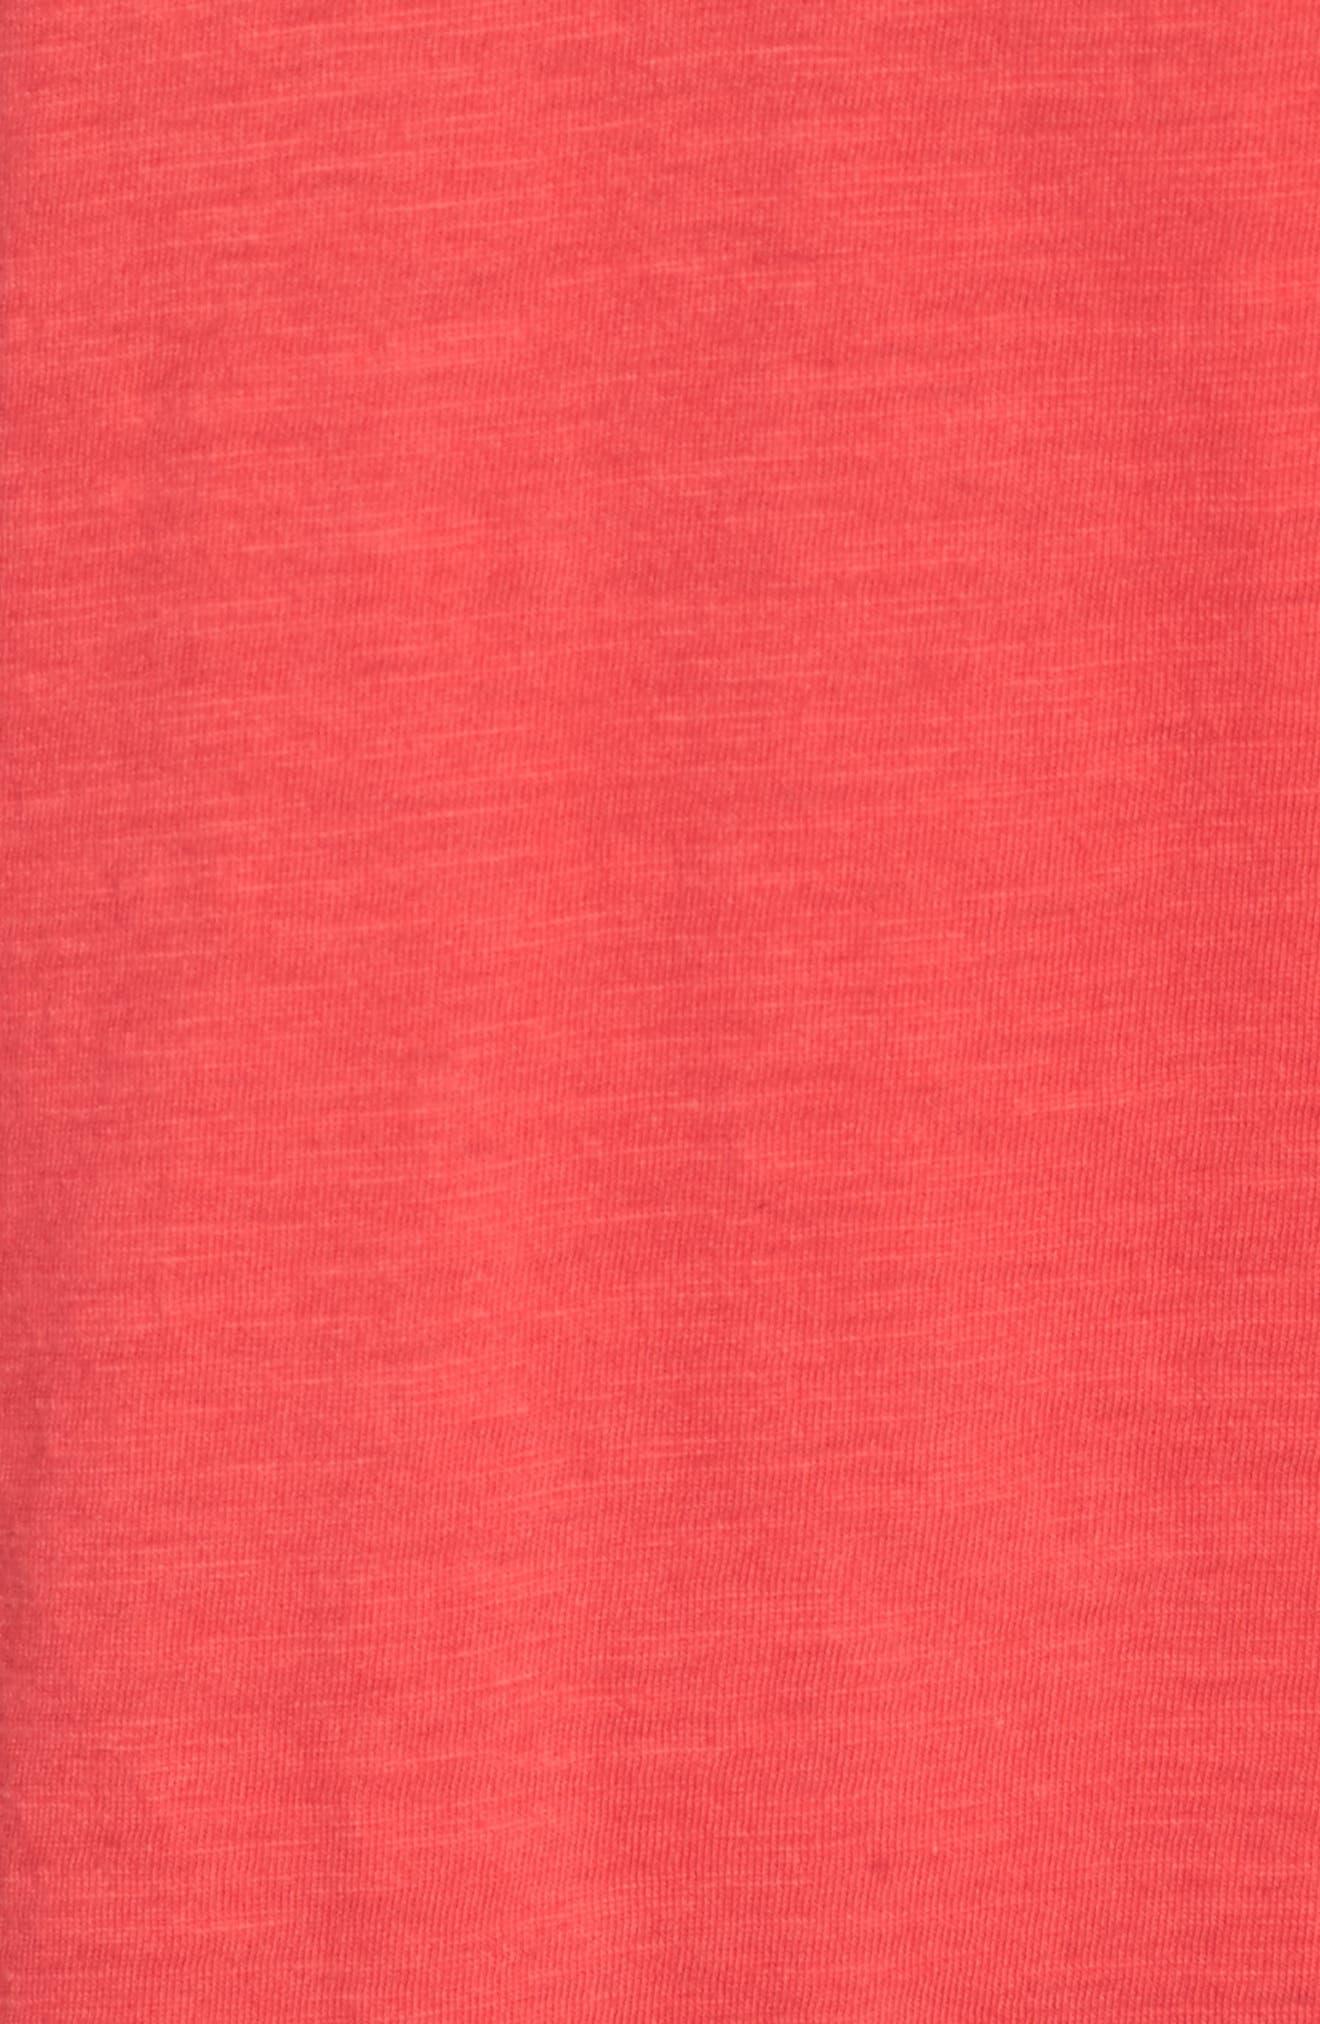 Organic Cotton V-Neck Tee,                             Alternate thumbnail 37, color,